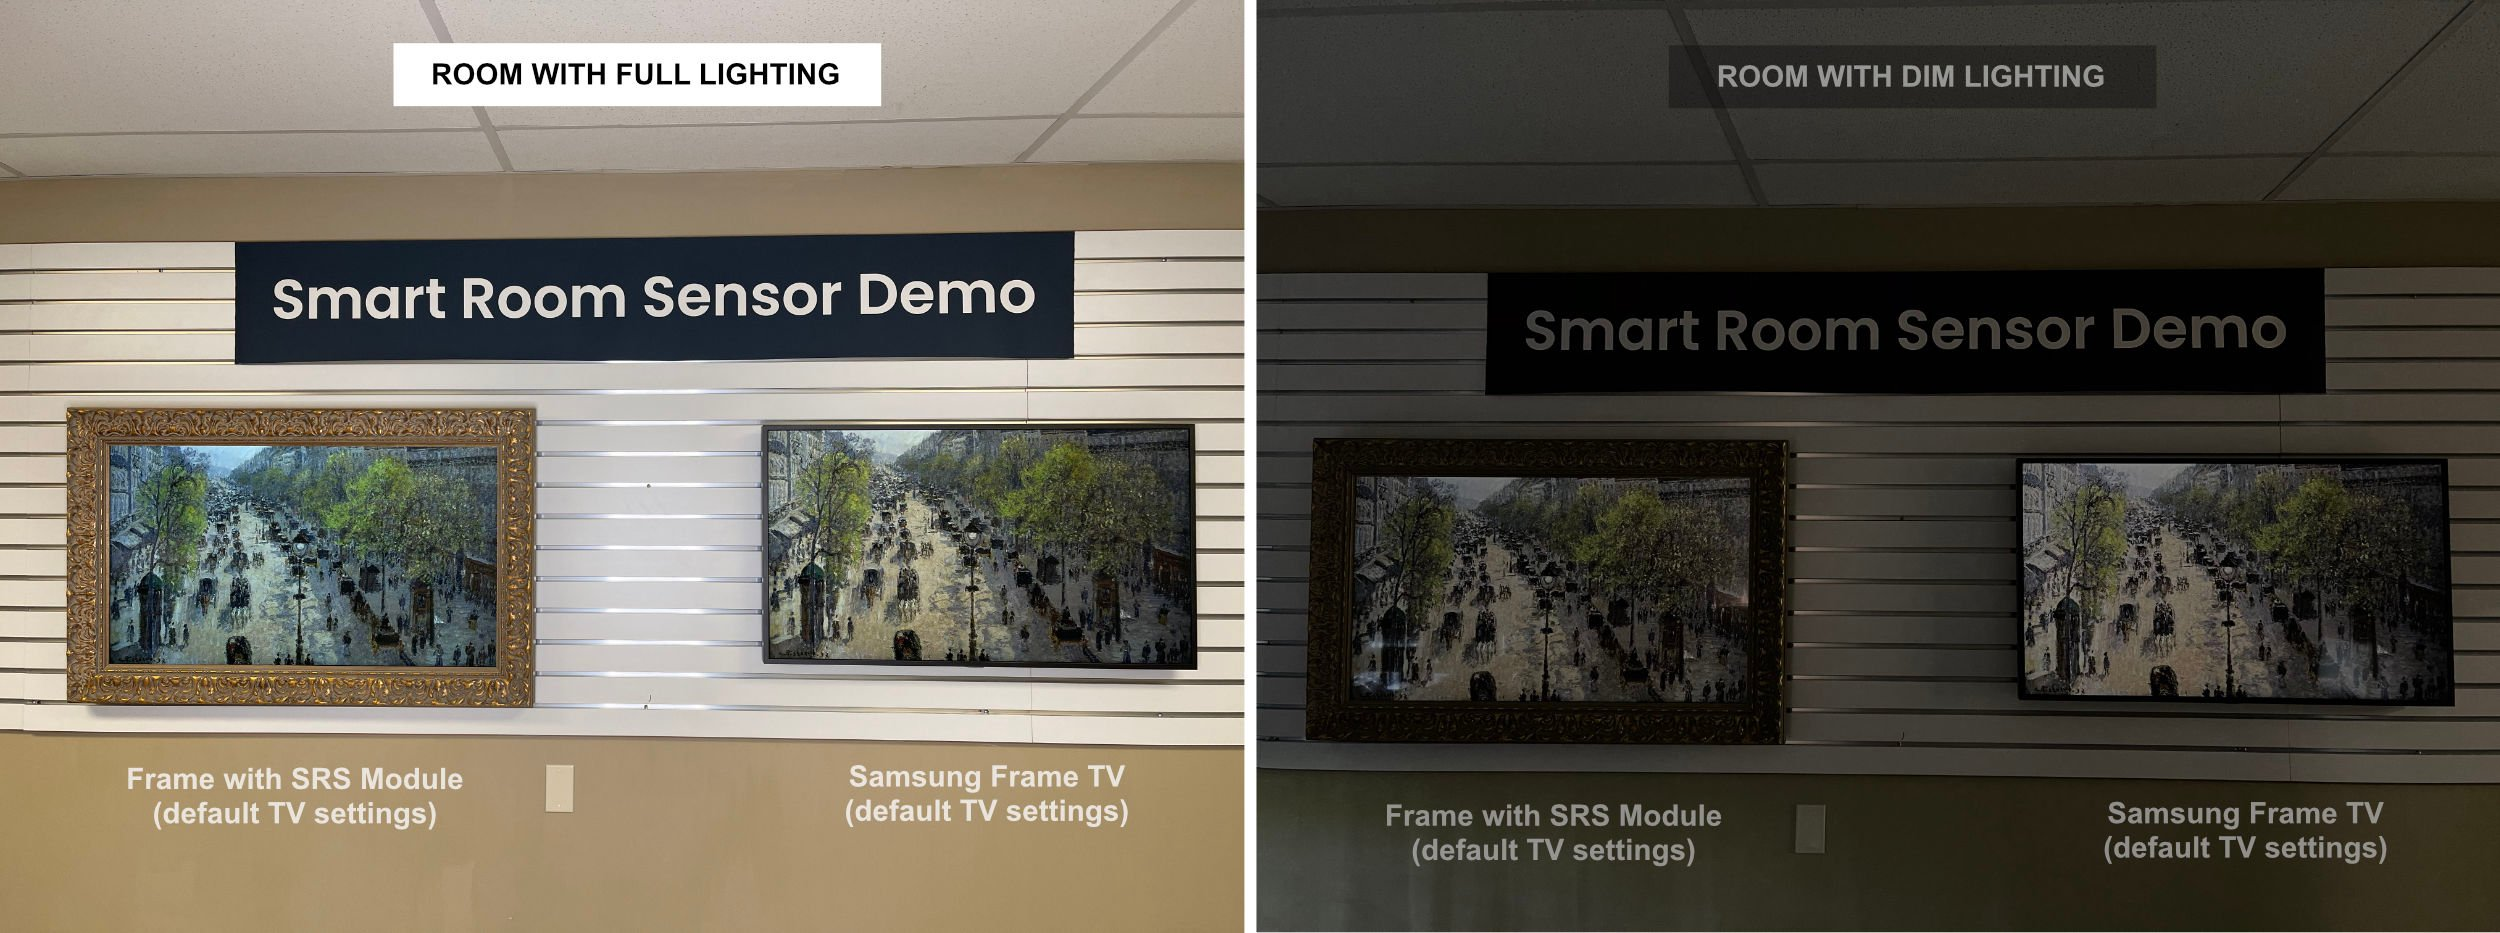 Samsung Frame TV Light Sensor sensitivity